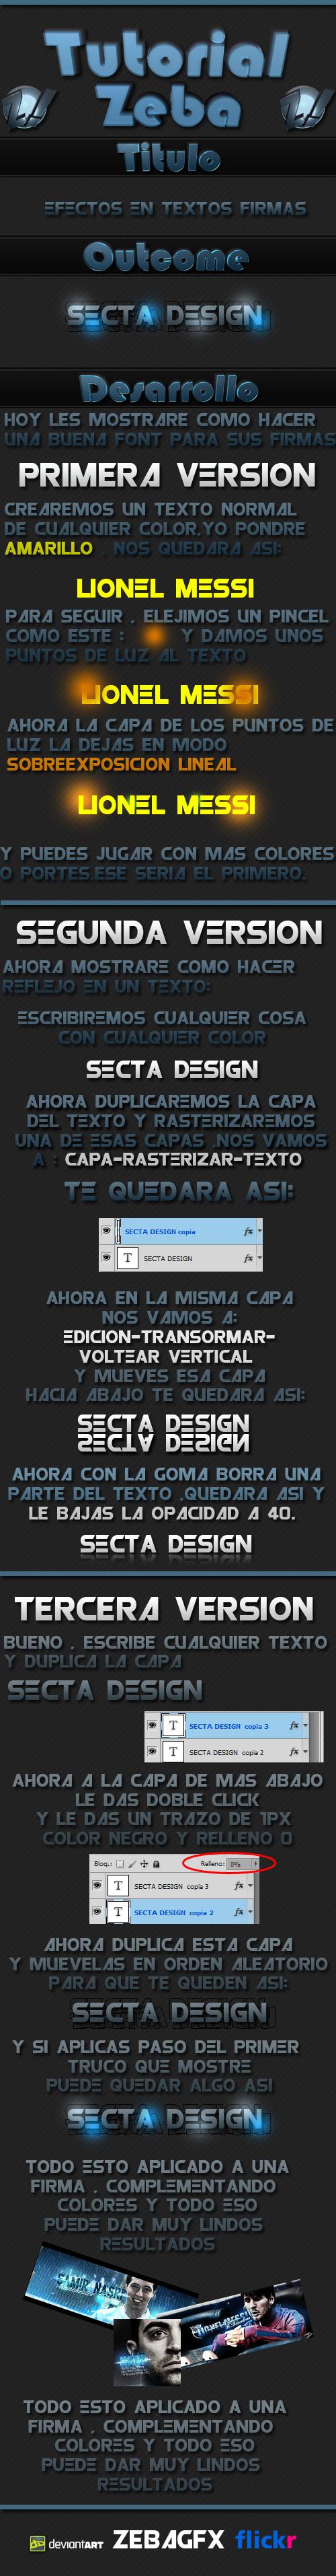 Tutorial 3 estilos de Font Tutorial_fonts_by_zebagfx-d4bpgmg